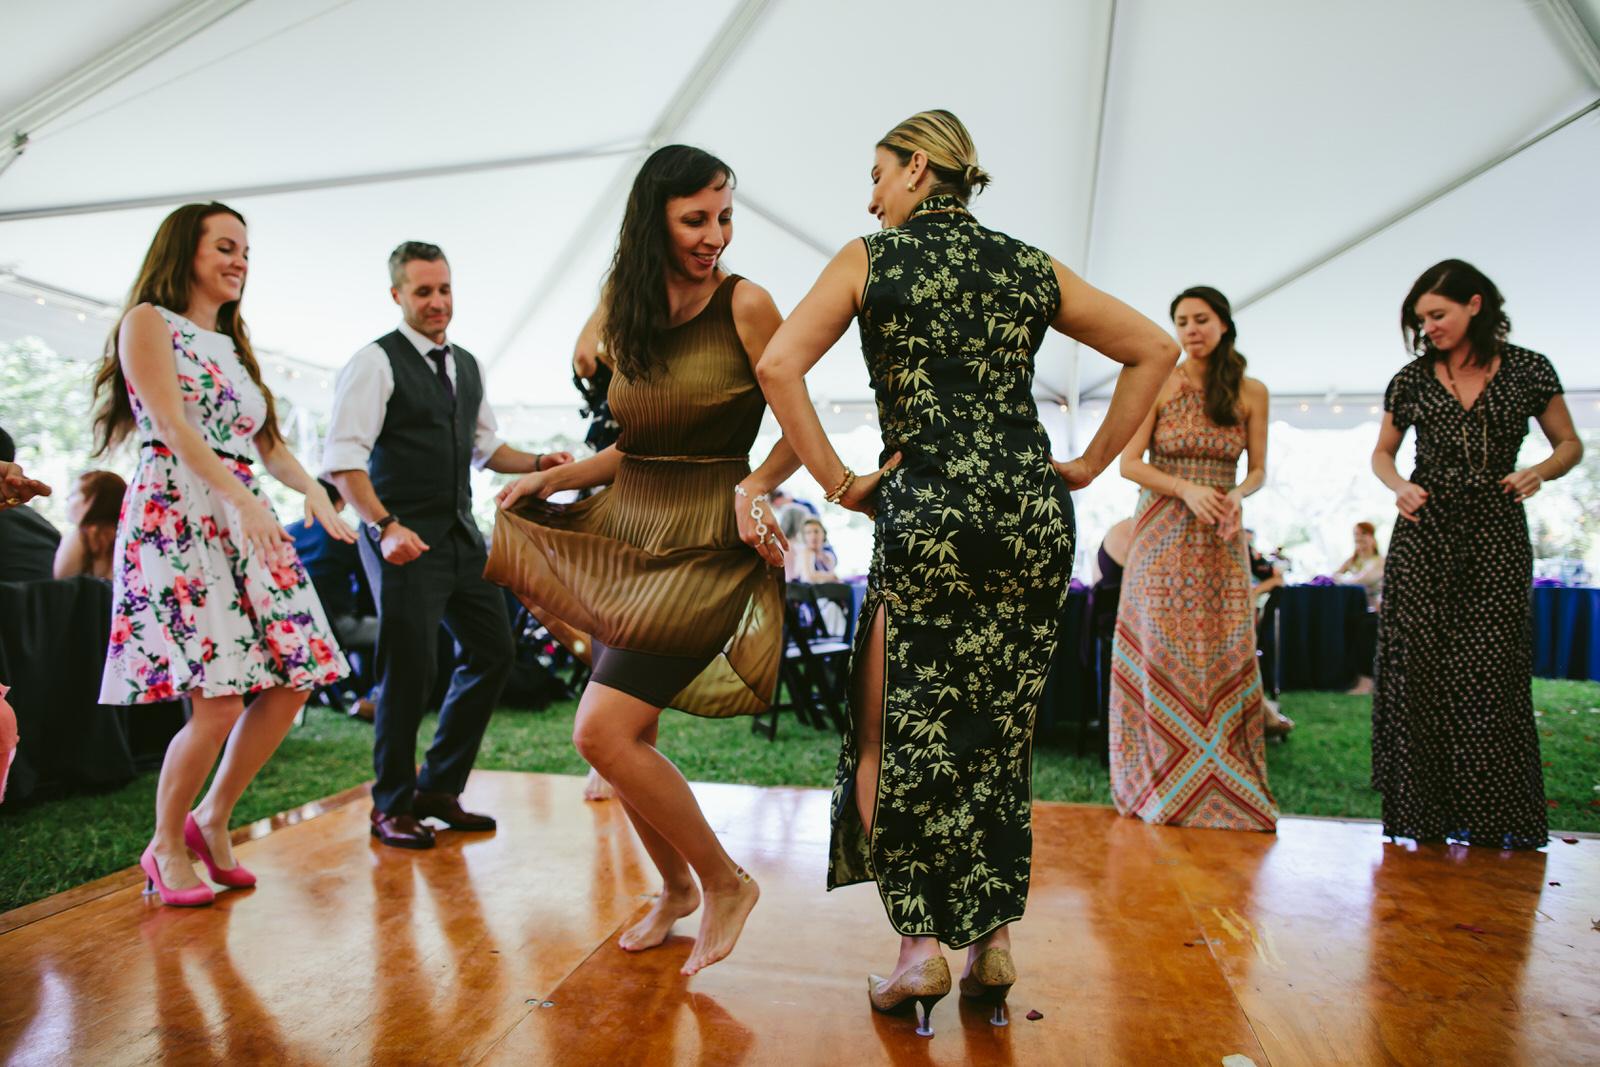 kashi-wedding-reception-tiny-house-photo-guests-dancing-fun.jpg